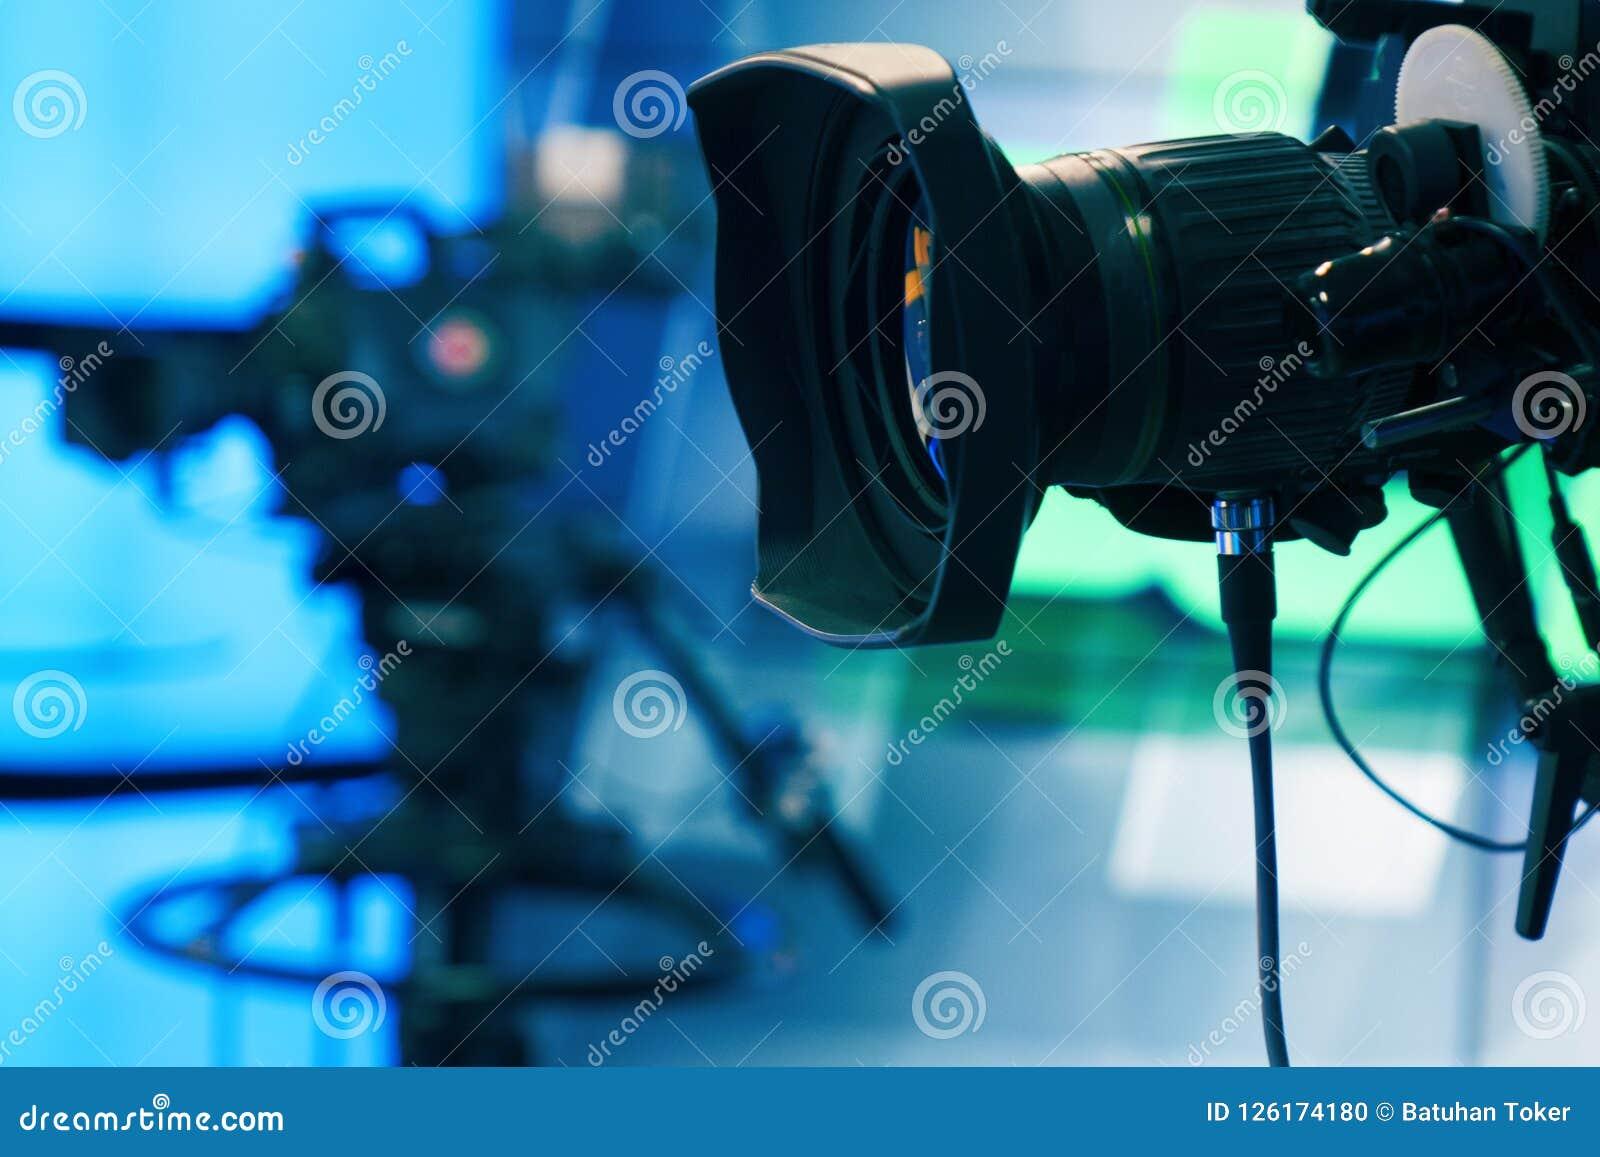 Broadcast television studio camera and crane camera in news studio room